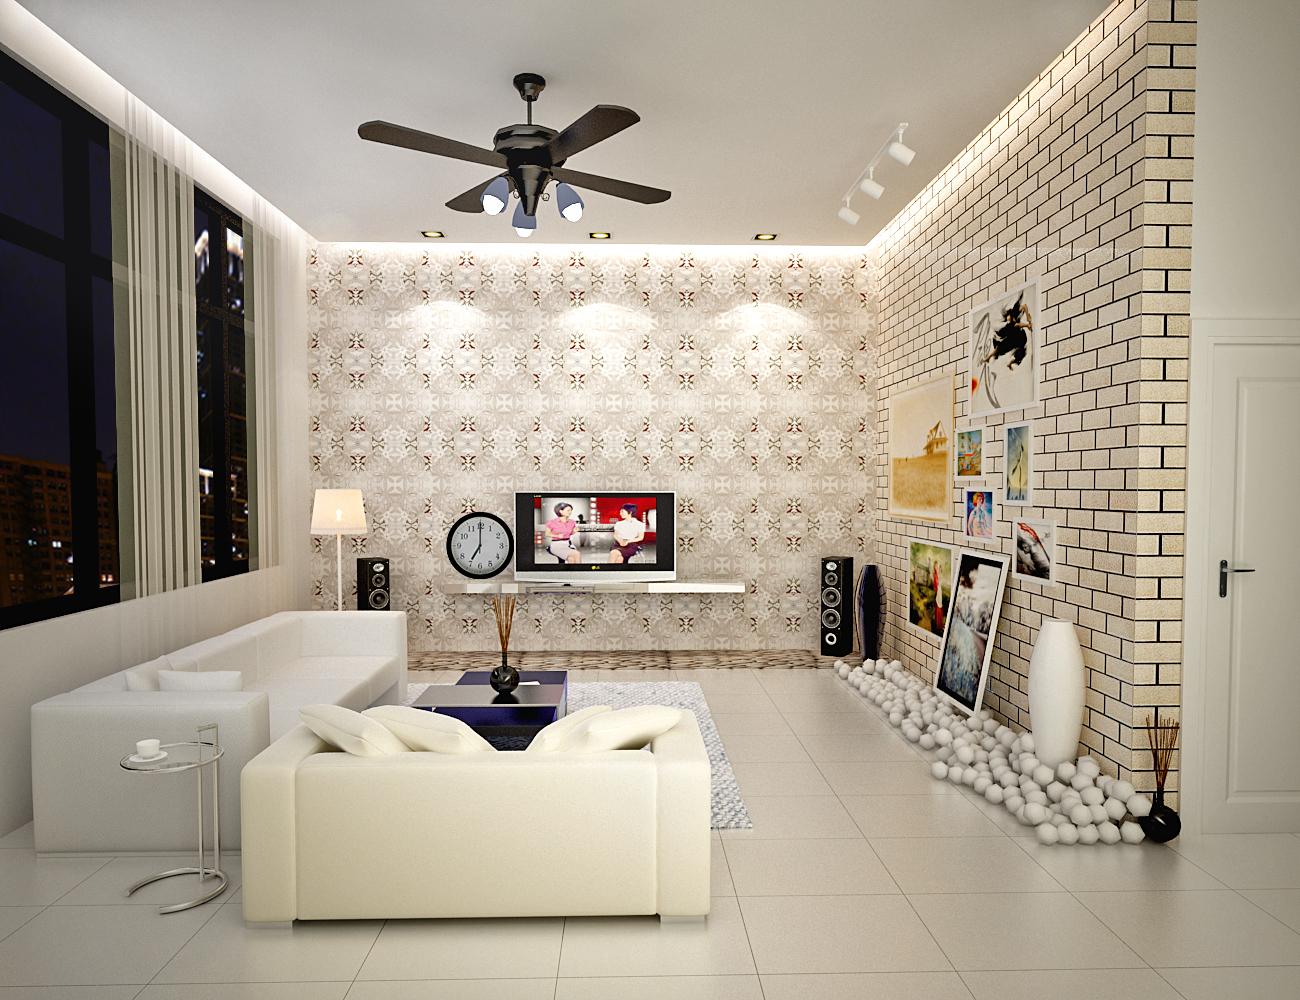 Interior Designs of Mens Apartments 1300x1000